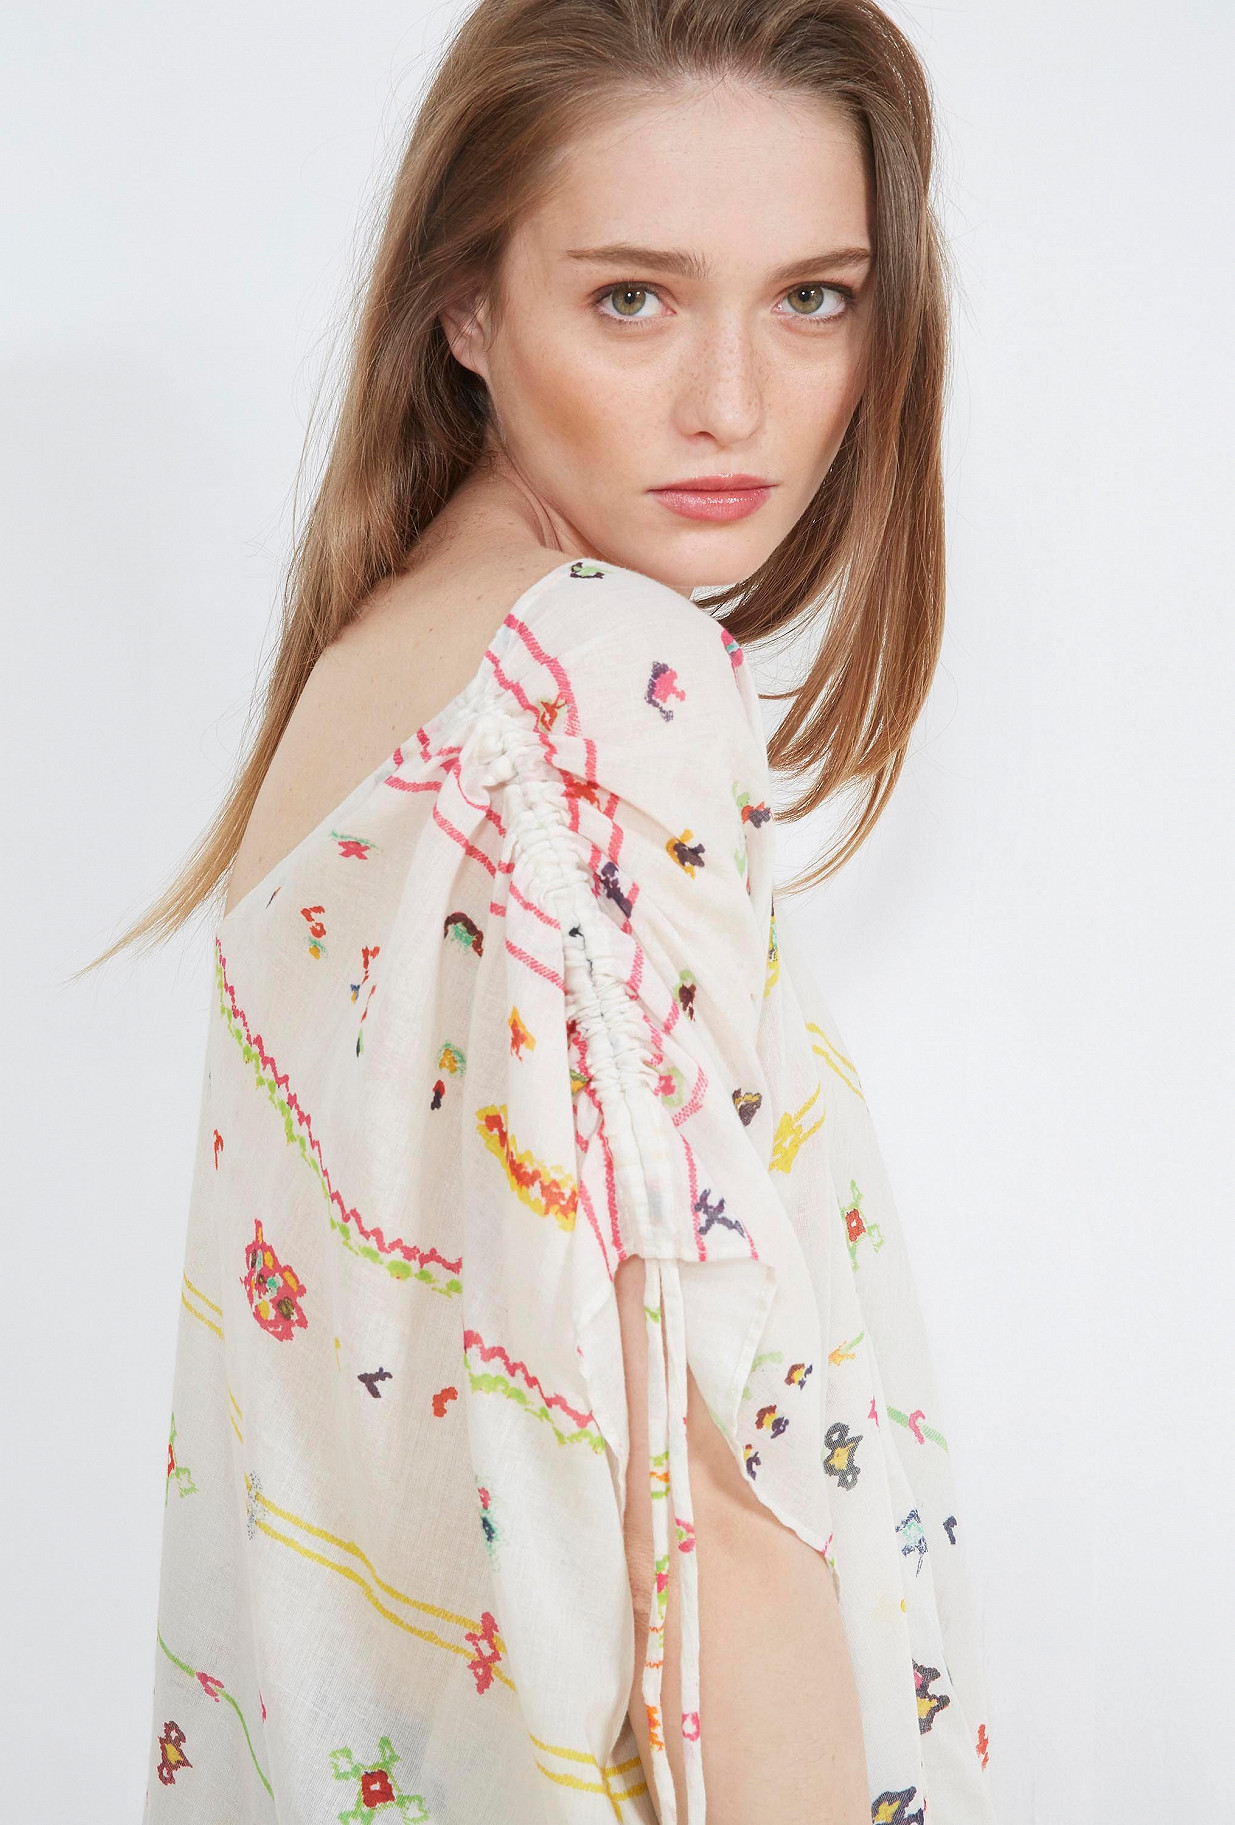 clothes store PONCHO  Salah french designer fashion Paris